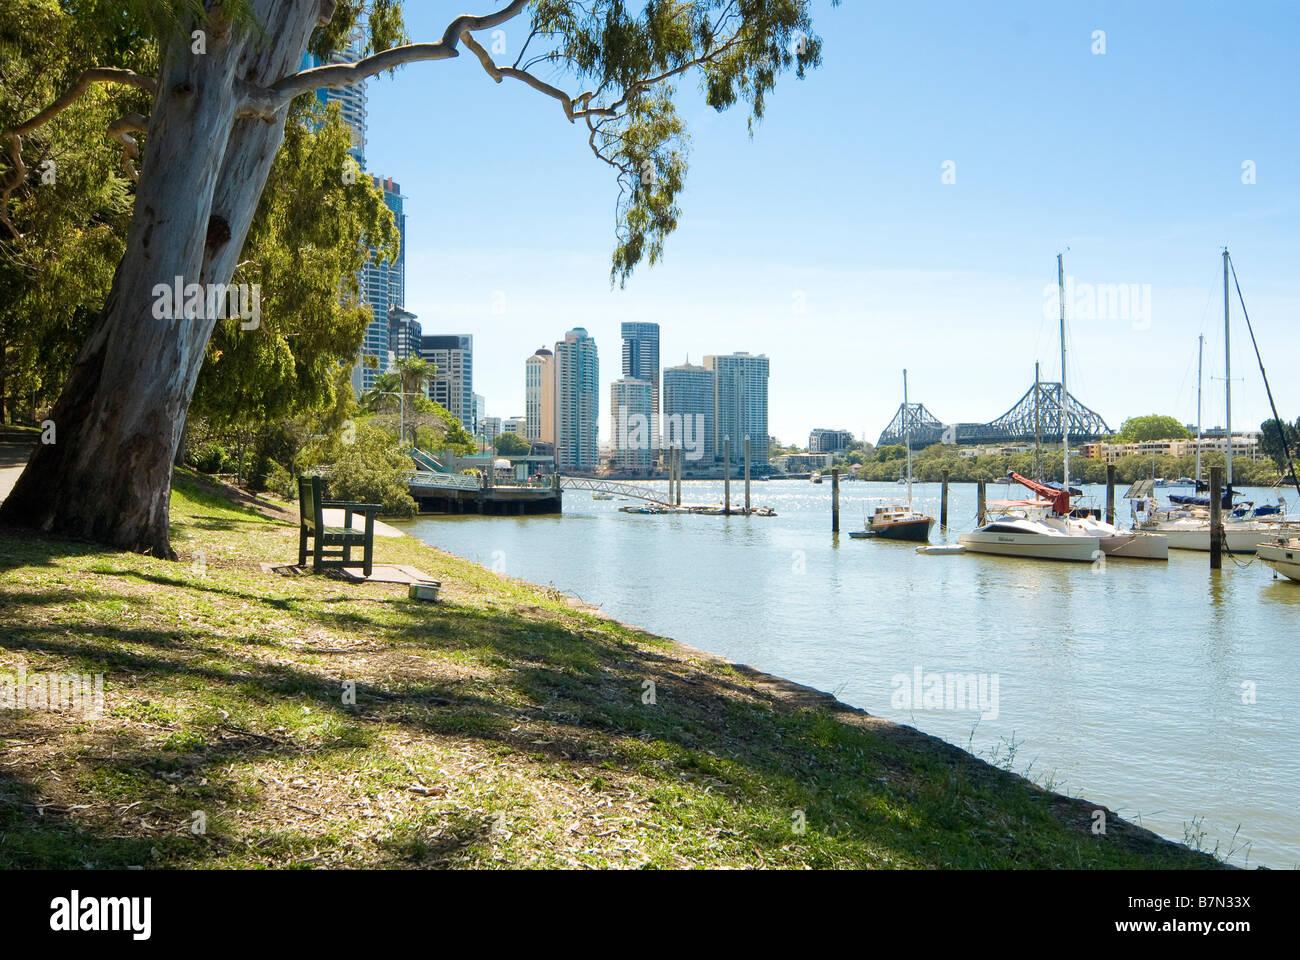 Brisbane River with skyline of Brisbane, Queensland, Australia - Stock Image